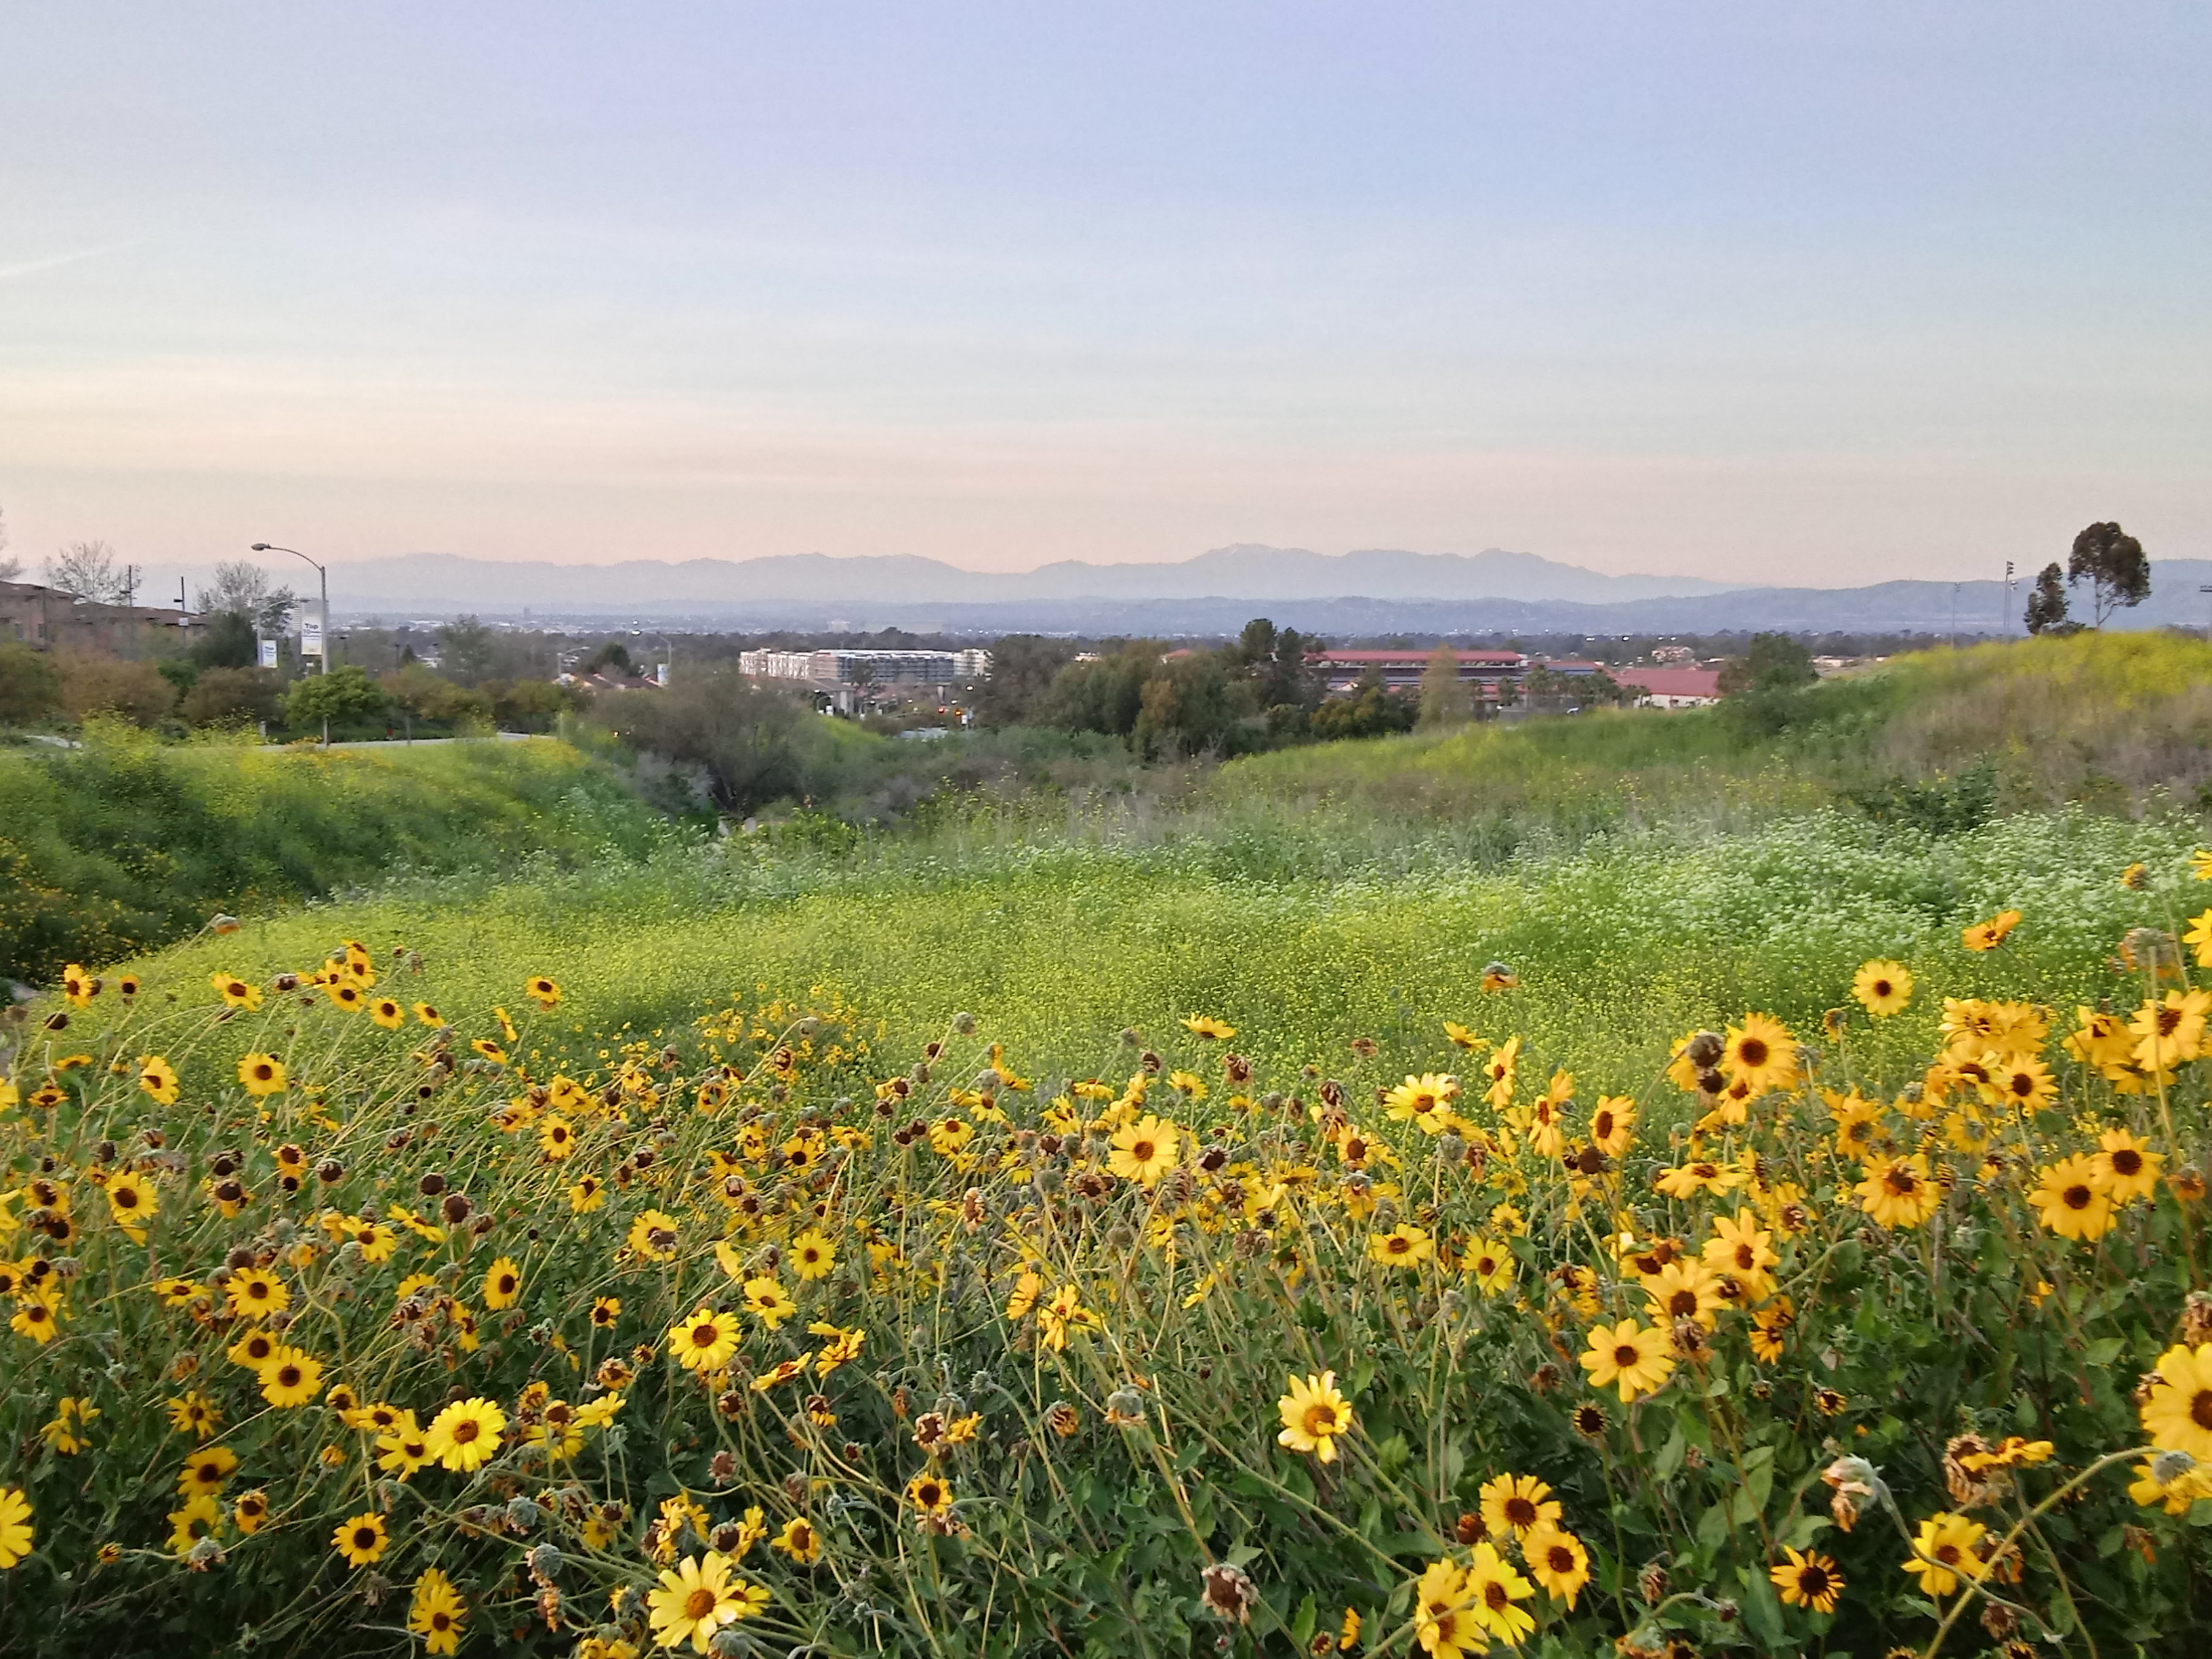 Spring at UC Irvine